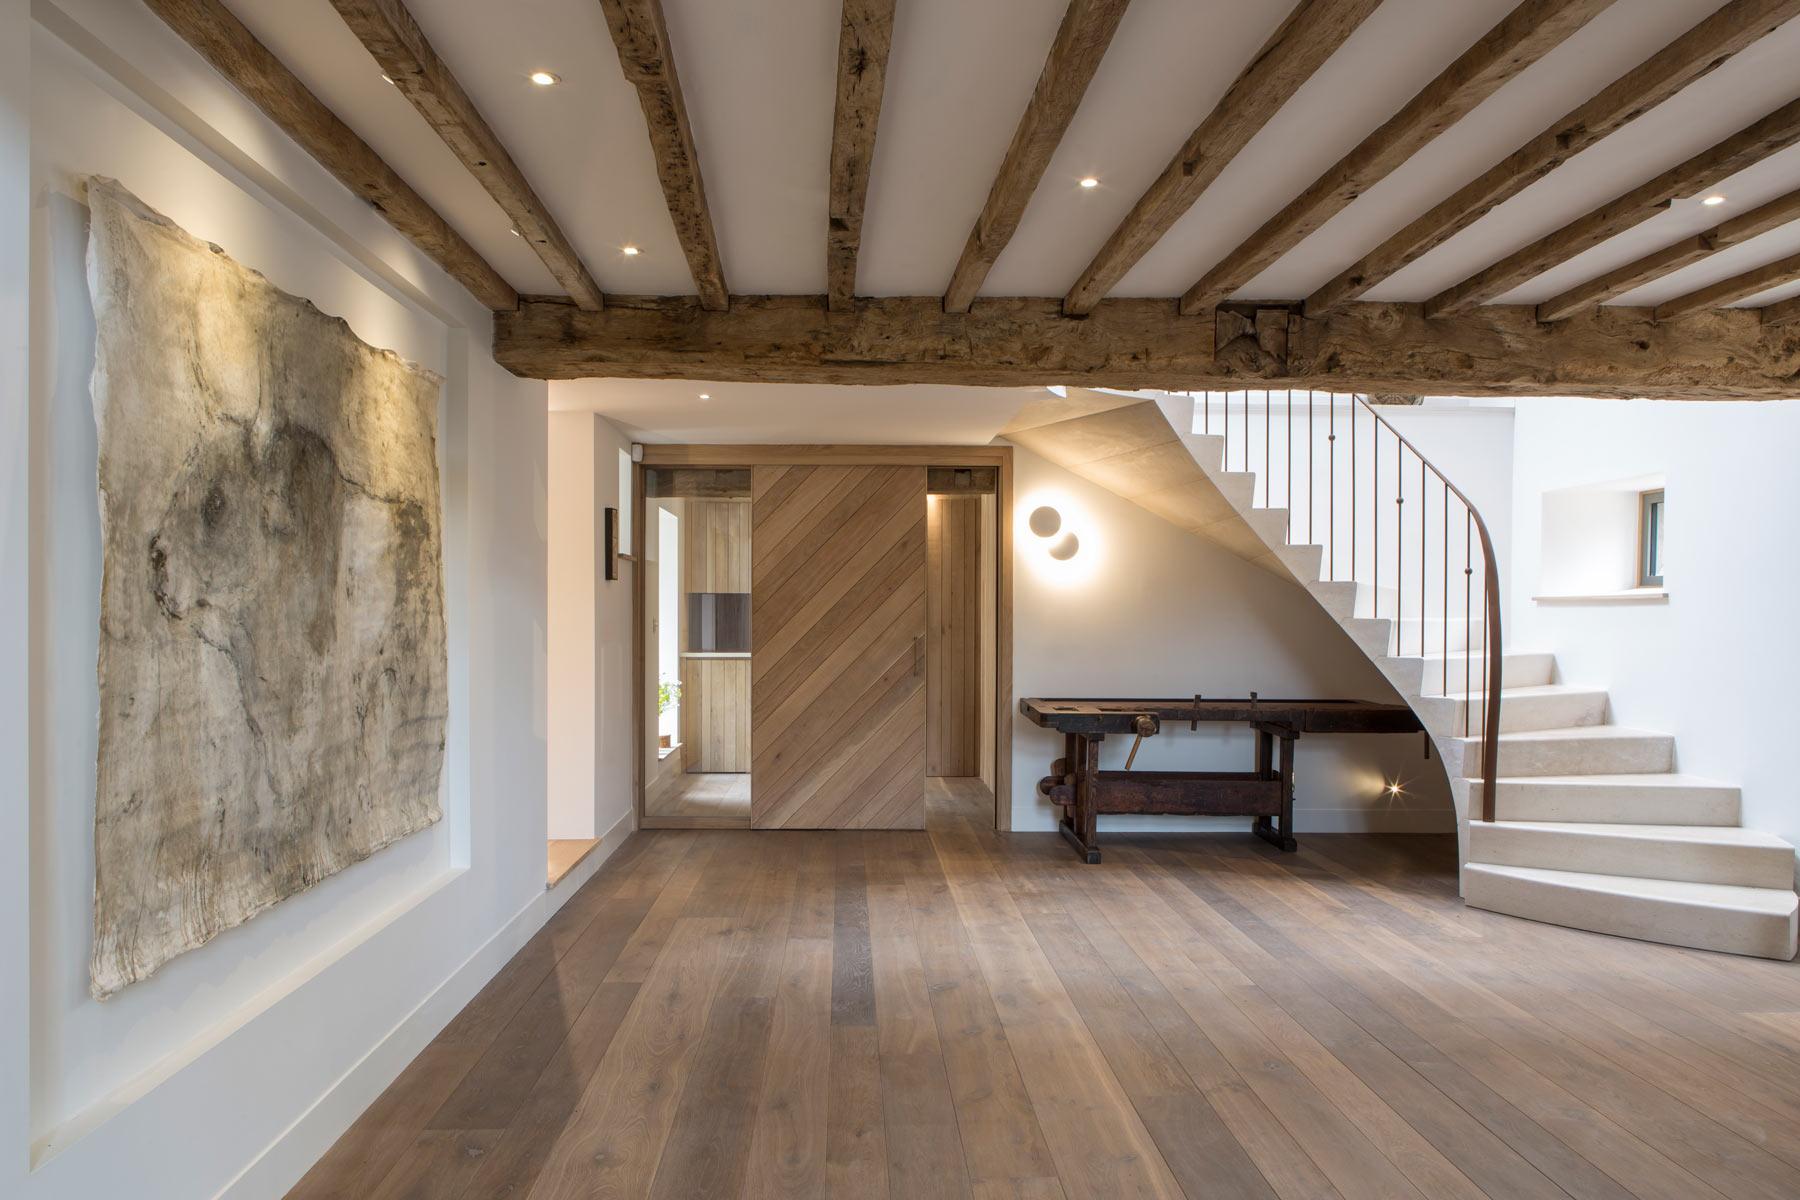 barn-conversion-oxfordshire-rogue-designs-1.jpg